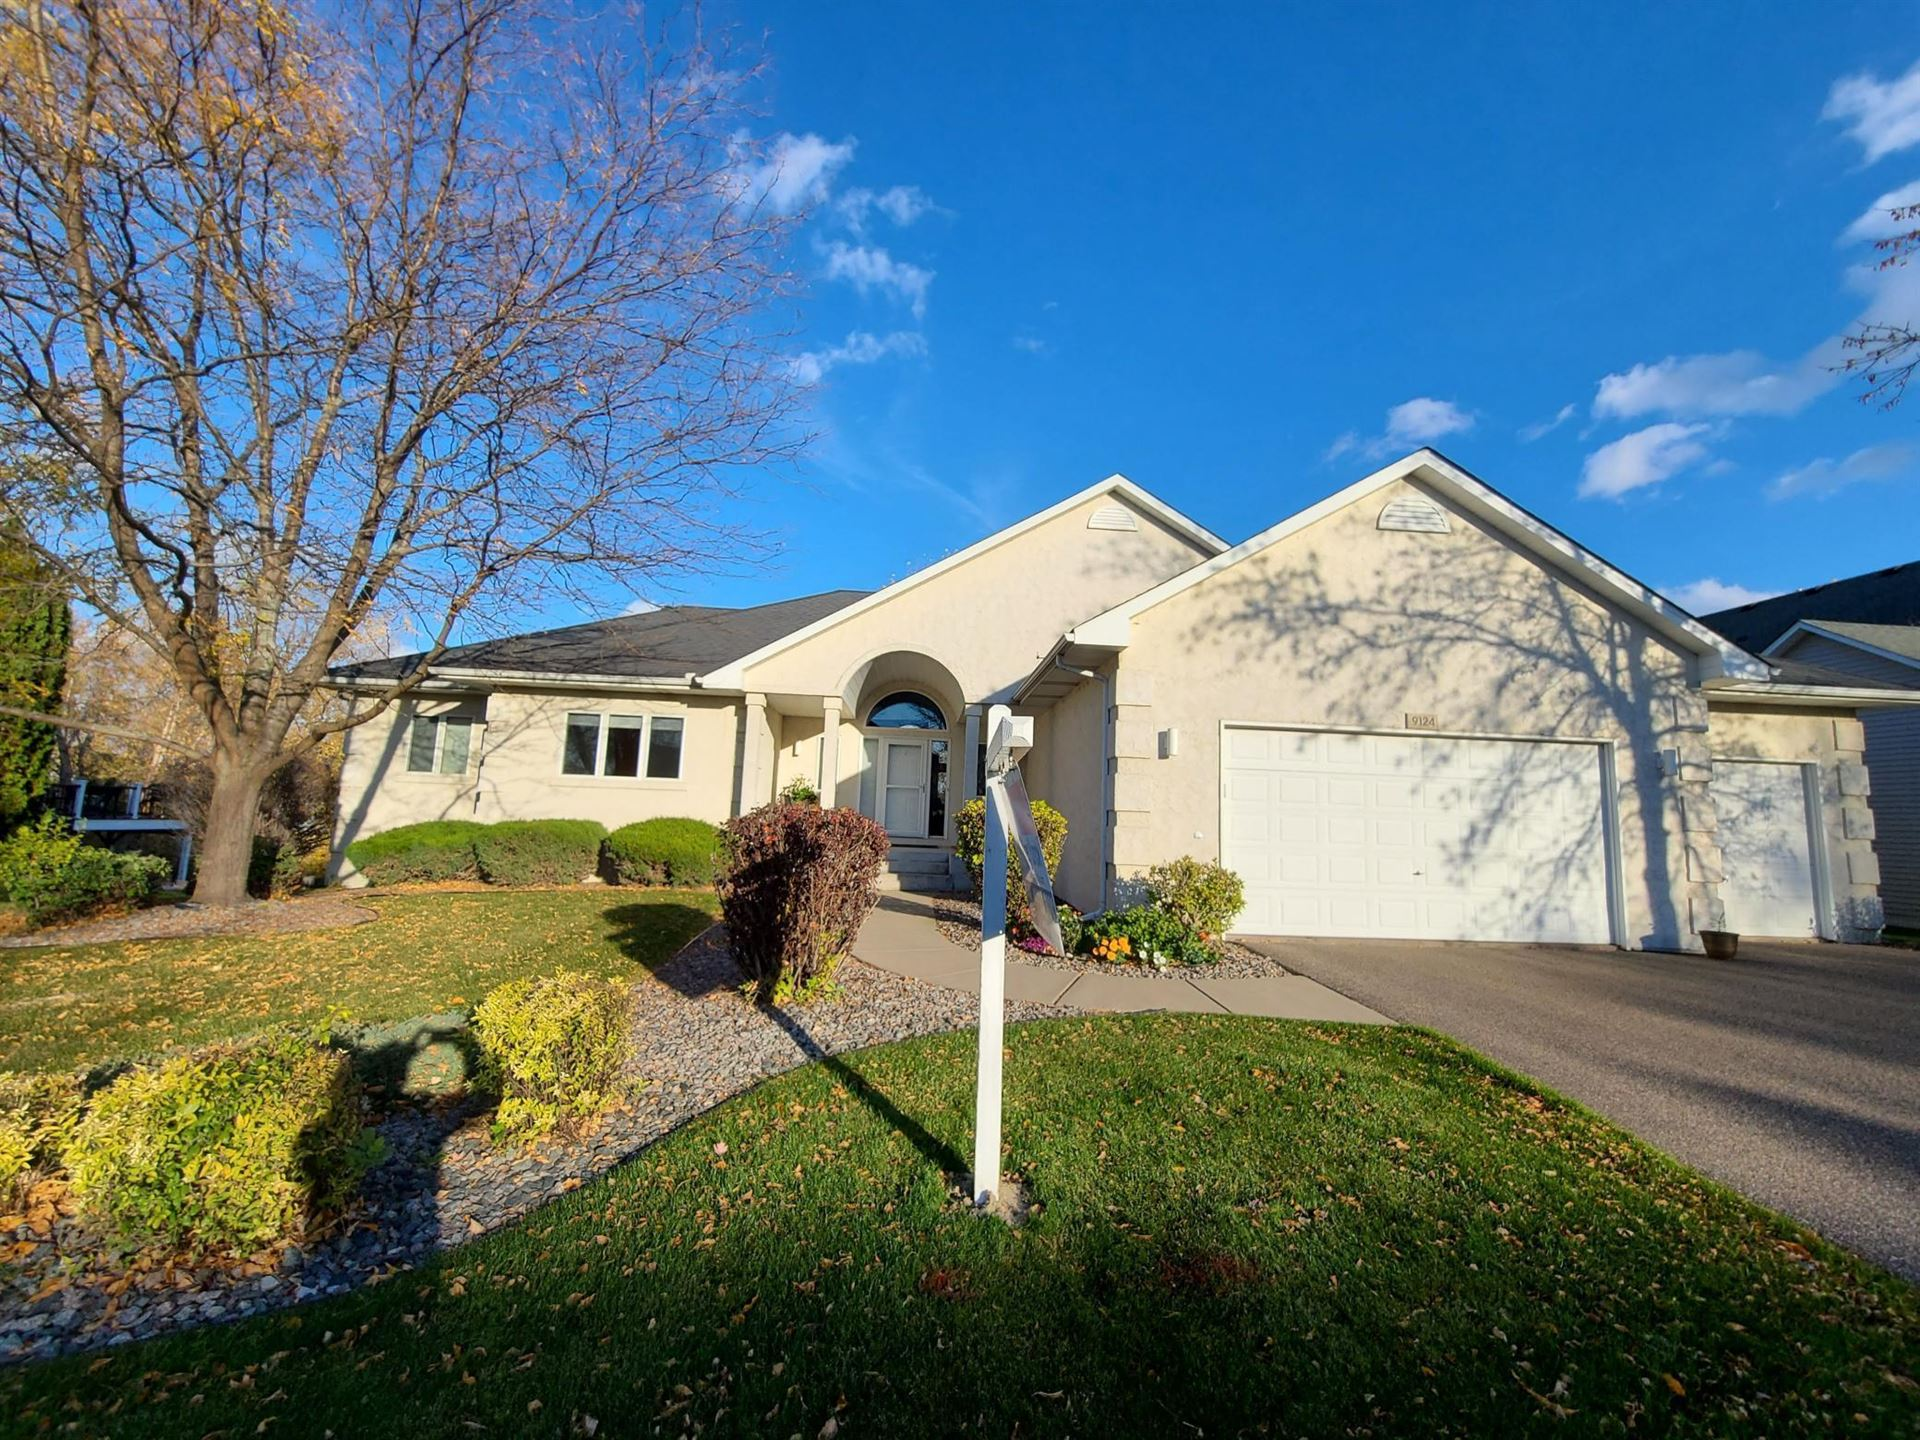 9124 Jewel Lane N, Maple Grove, MN 55311 - MLS#: 5645770